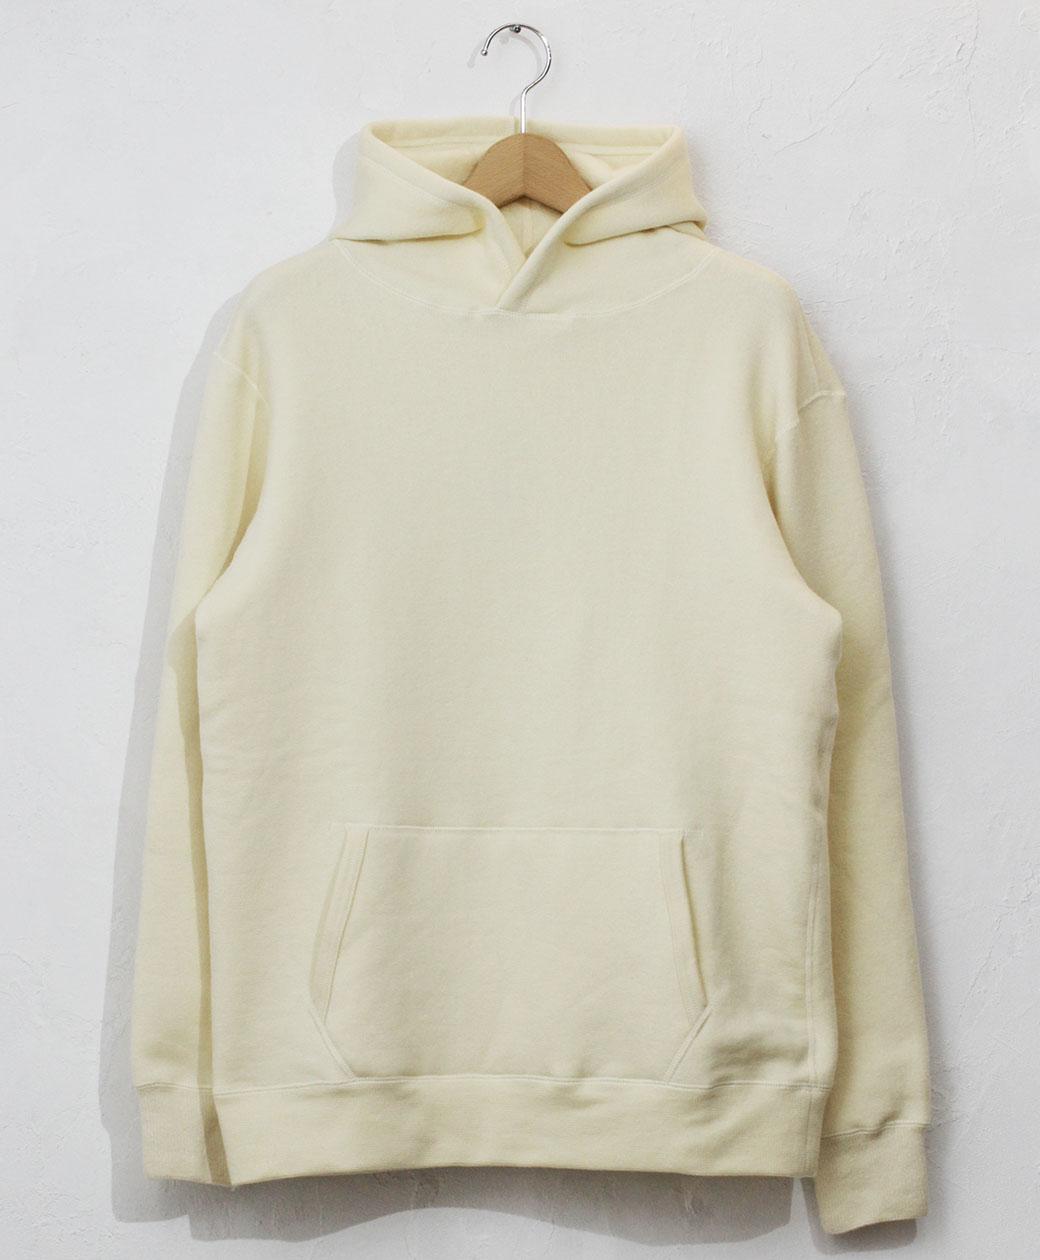 yetina 【2021FW限定カラー】pullover hoodie(kinari)